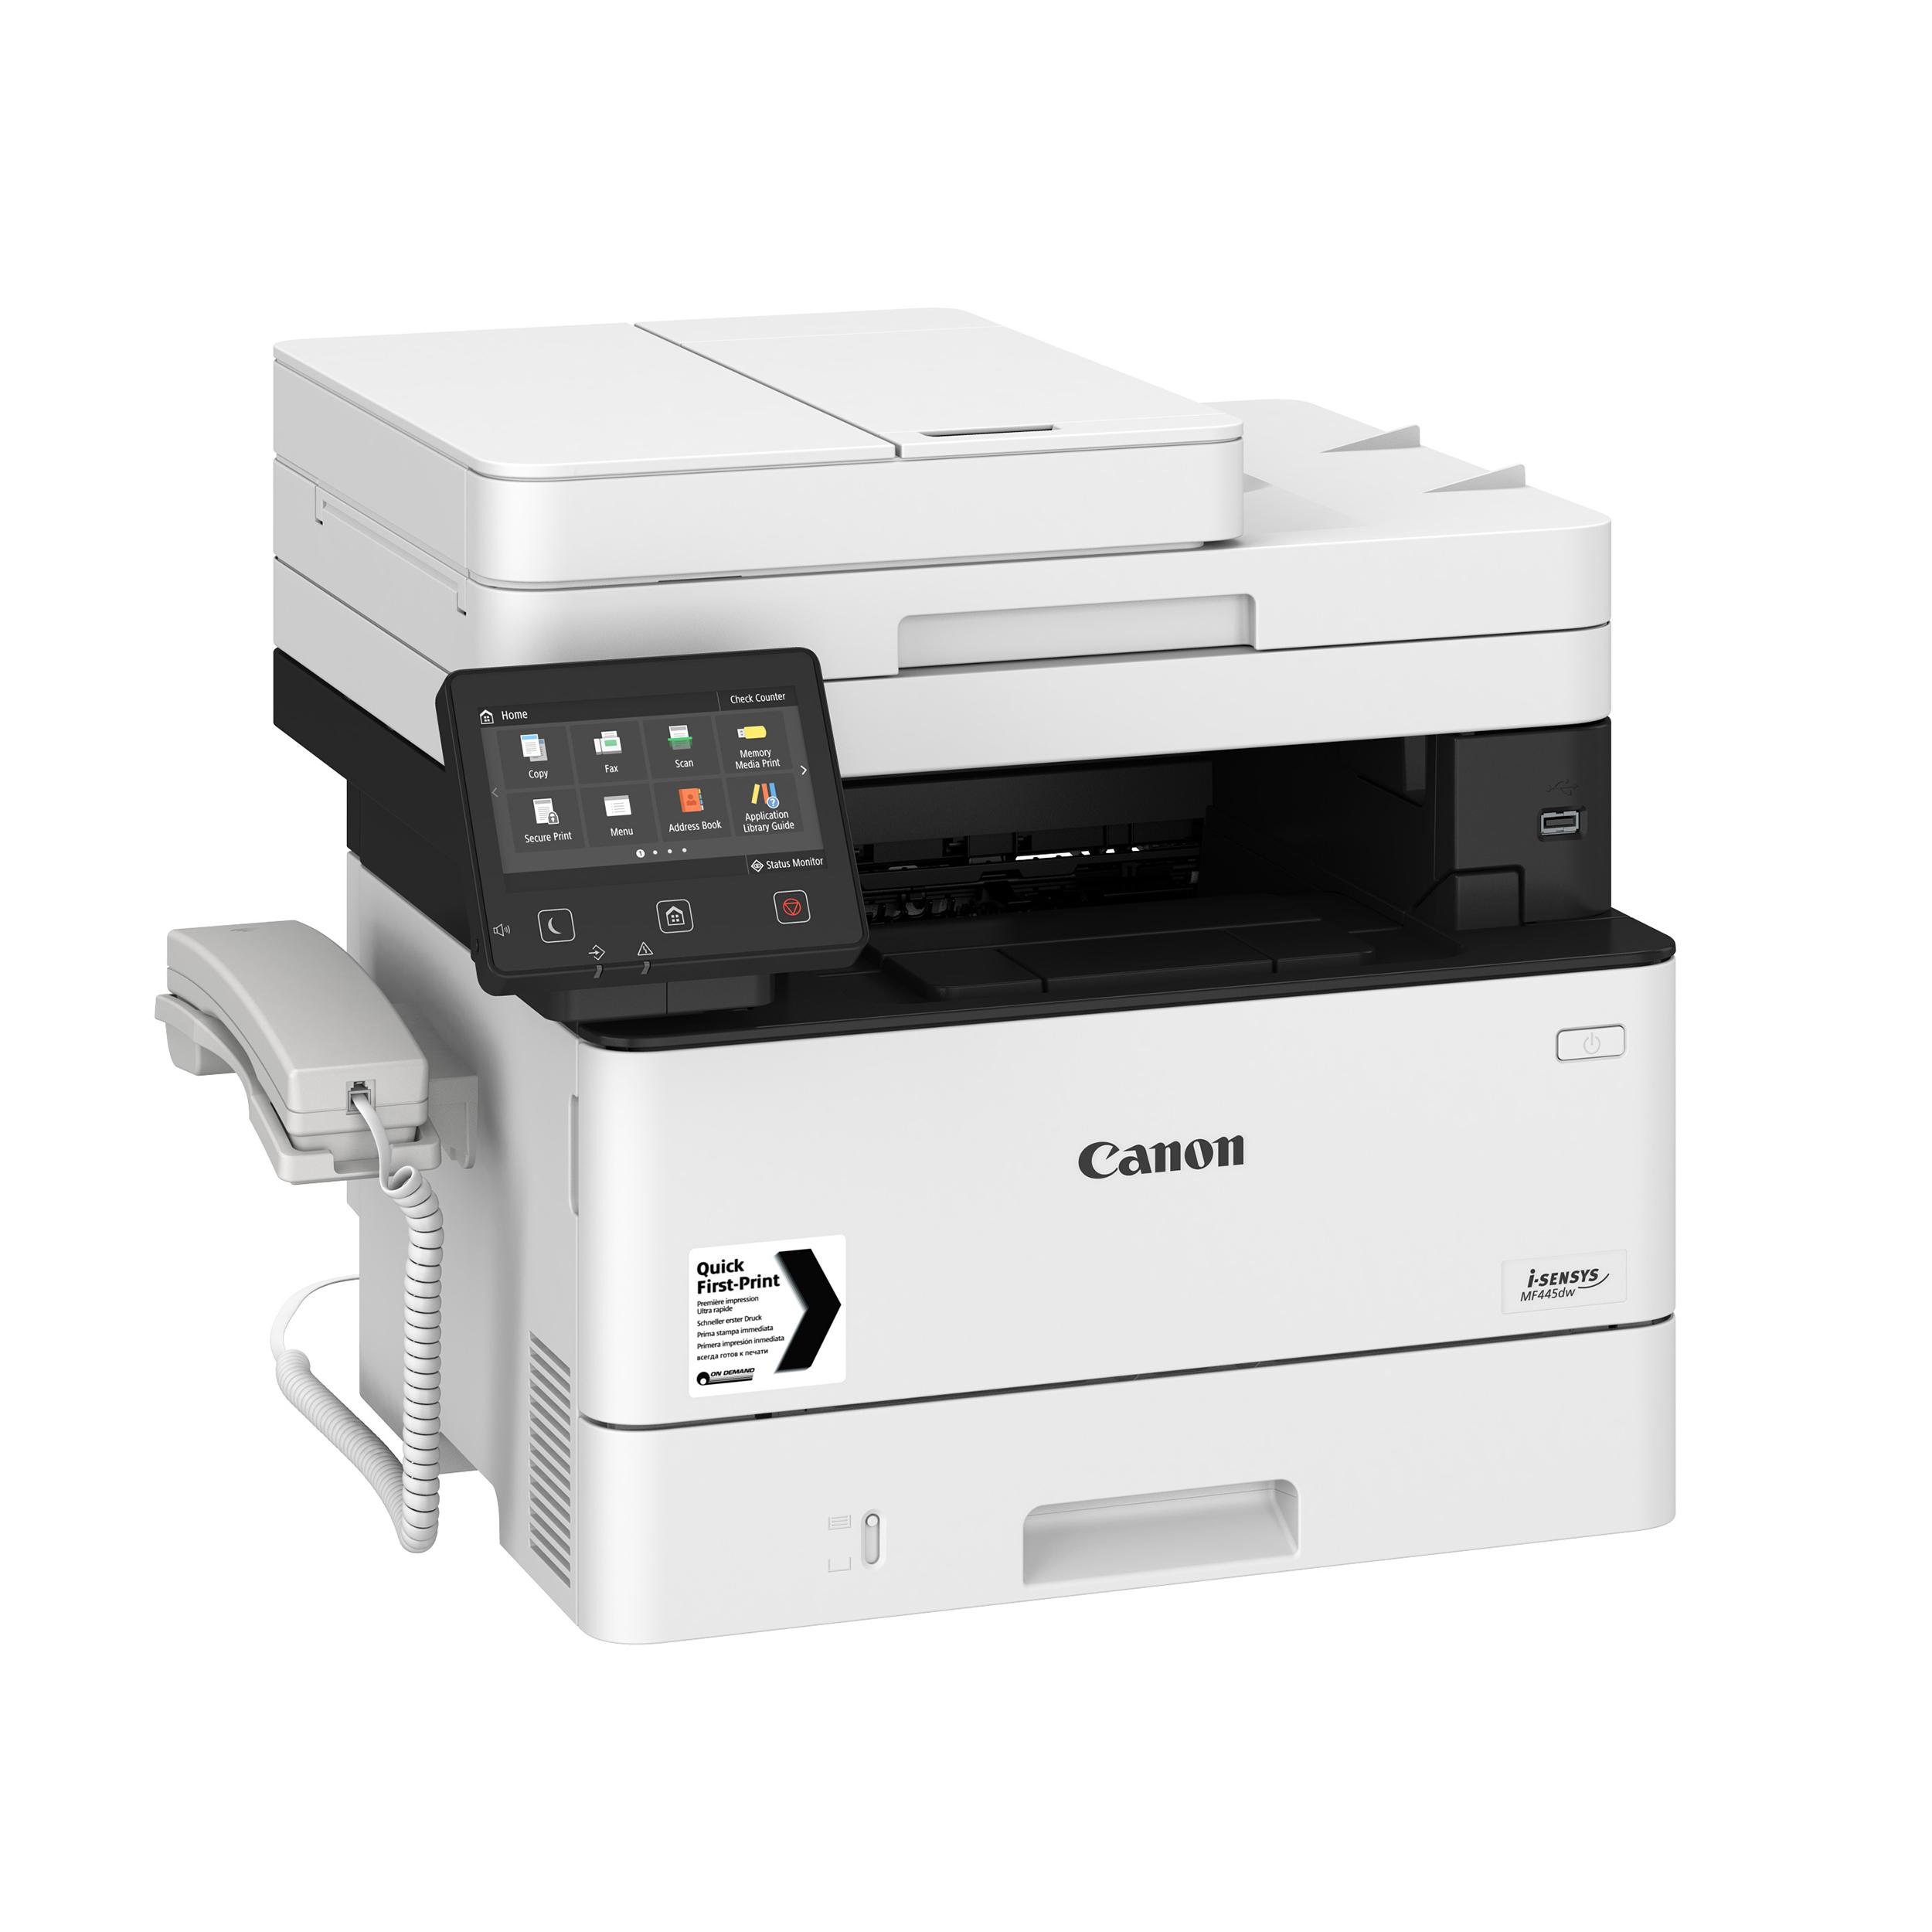 Laser printers Canon i-SENSYS MF445dw Multifunction Mono Laser A4 Printer Ref 3514C020AA